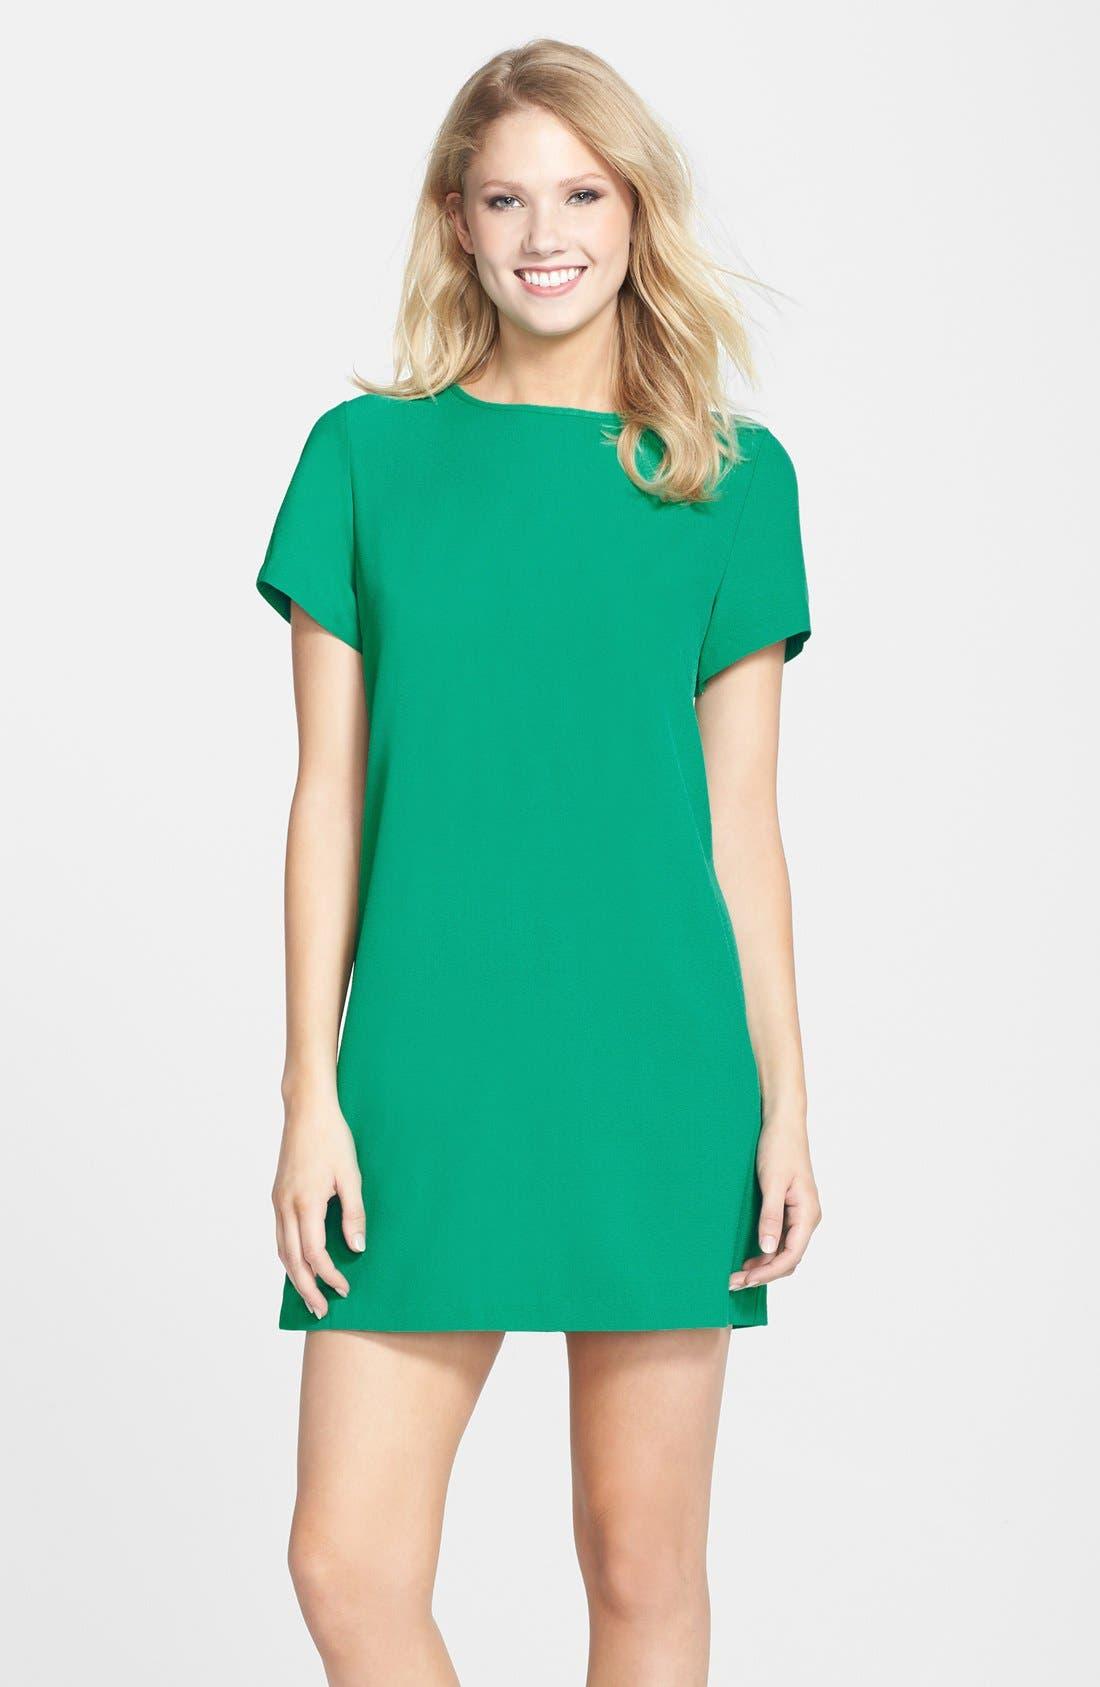 Devery Crepe Shift Dress,                             Main thumbnail 1, color,                             EMERALD GREEN